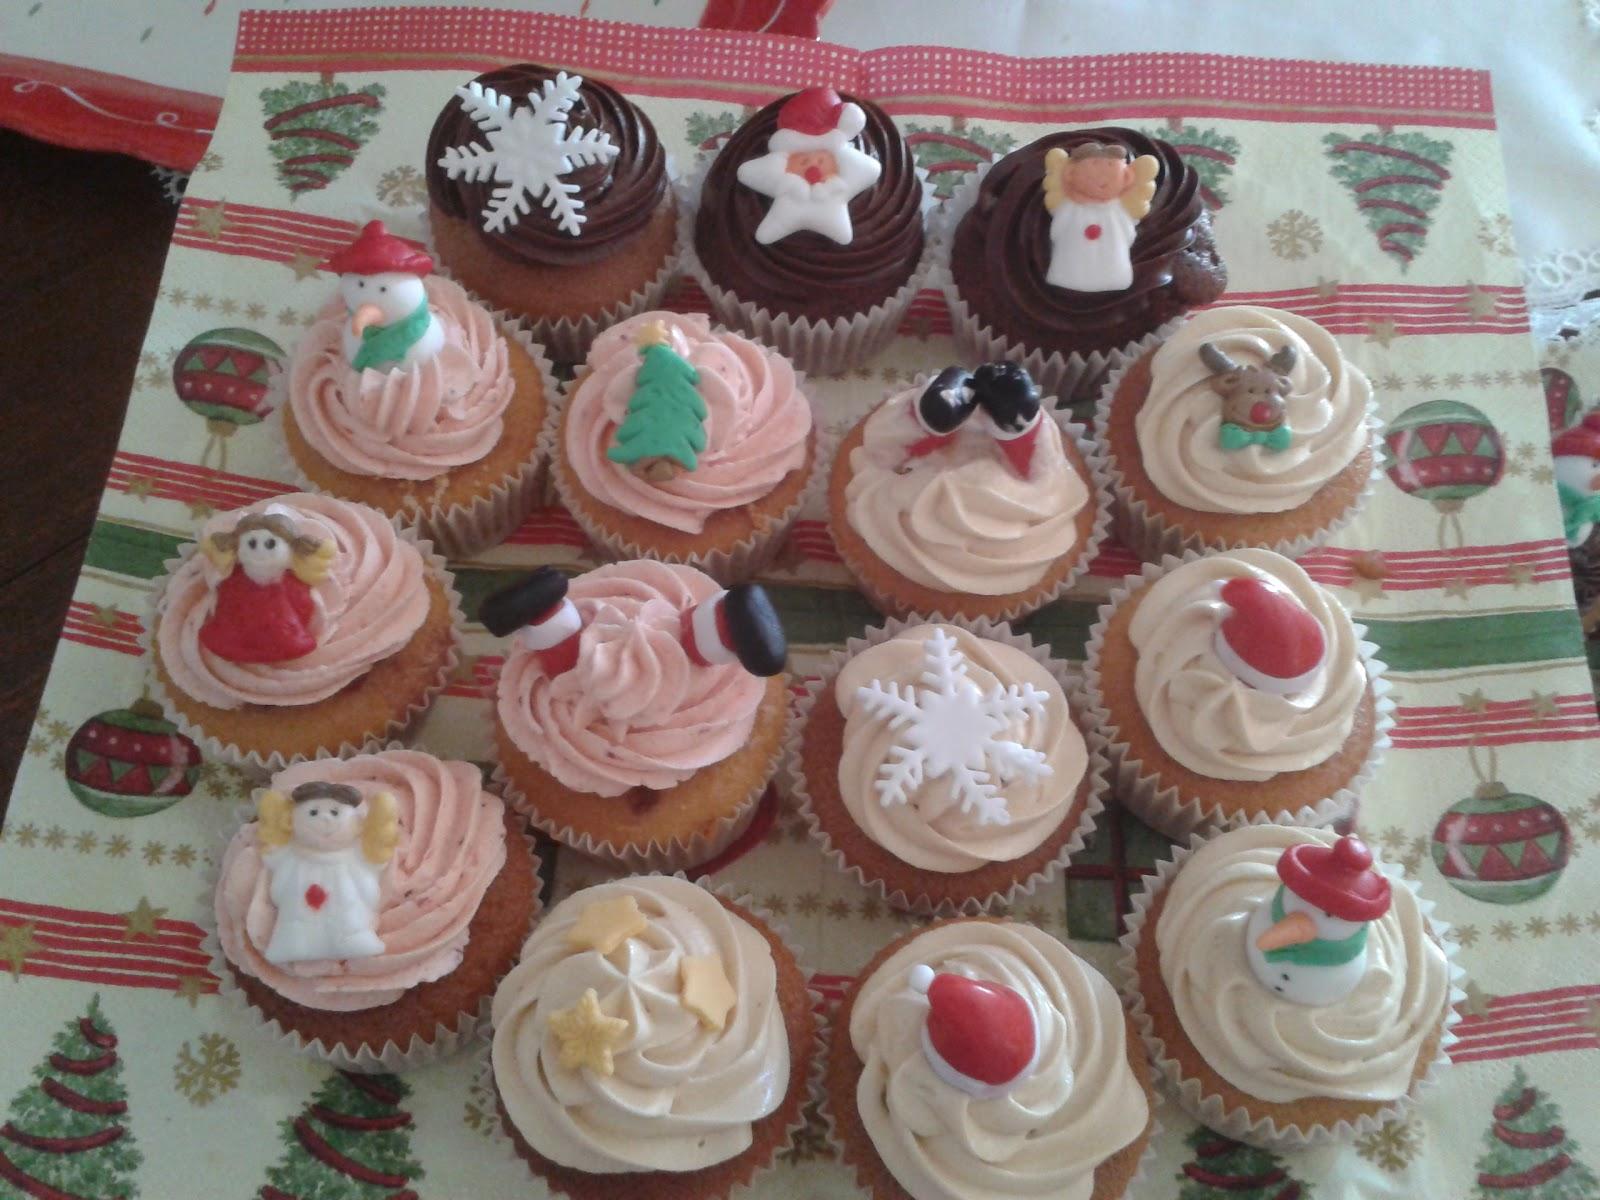 Cupcakes tenerife cupcakes de navidad - Cupcakes tenerife ...